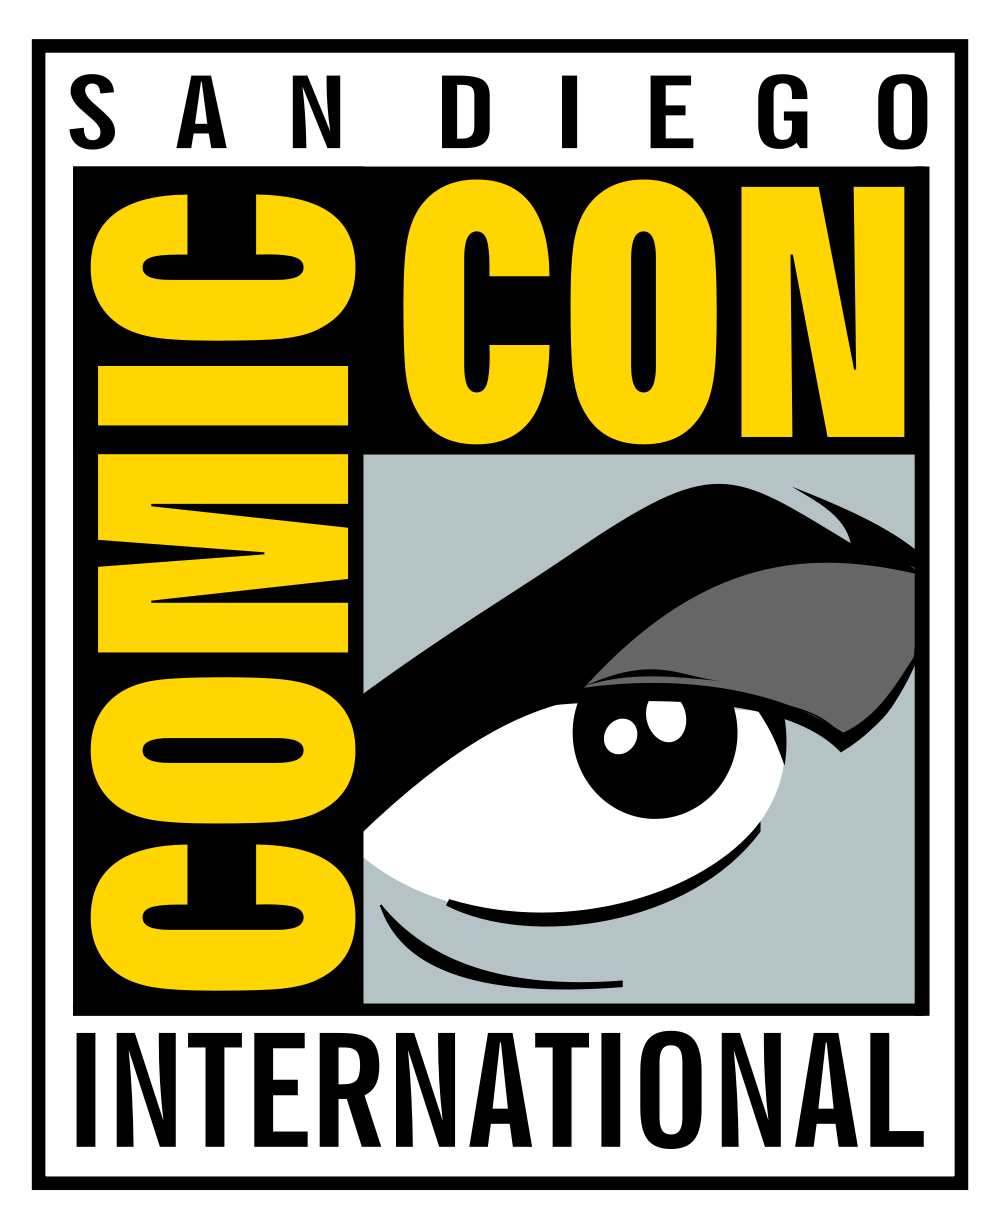 Firefly alla San Diego Comic-Con